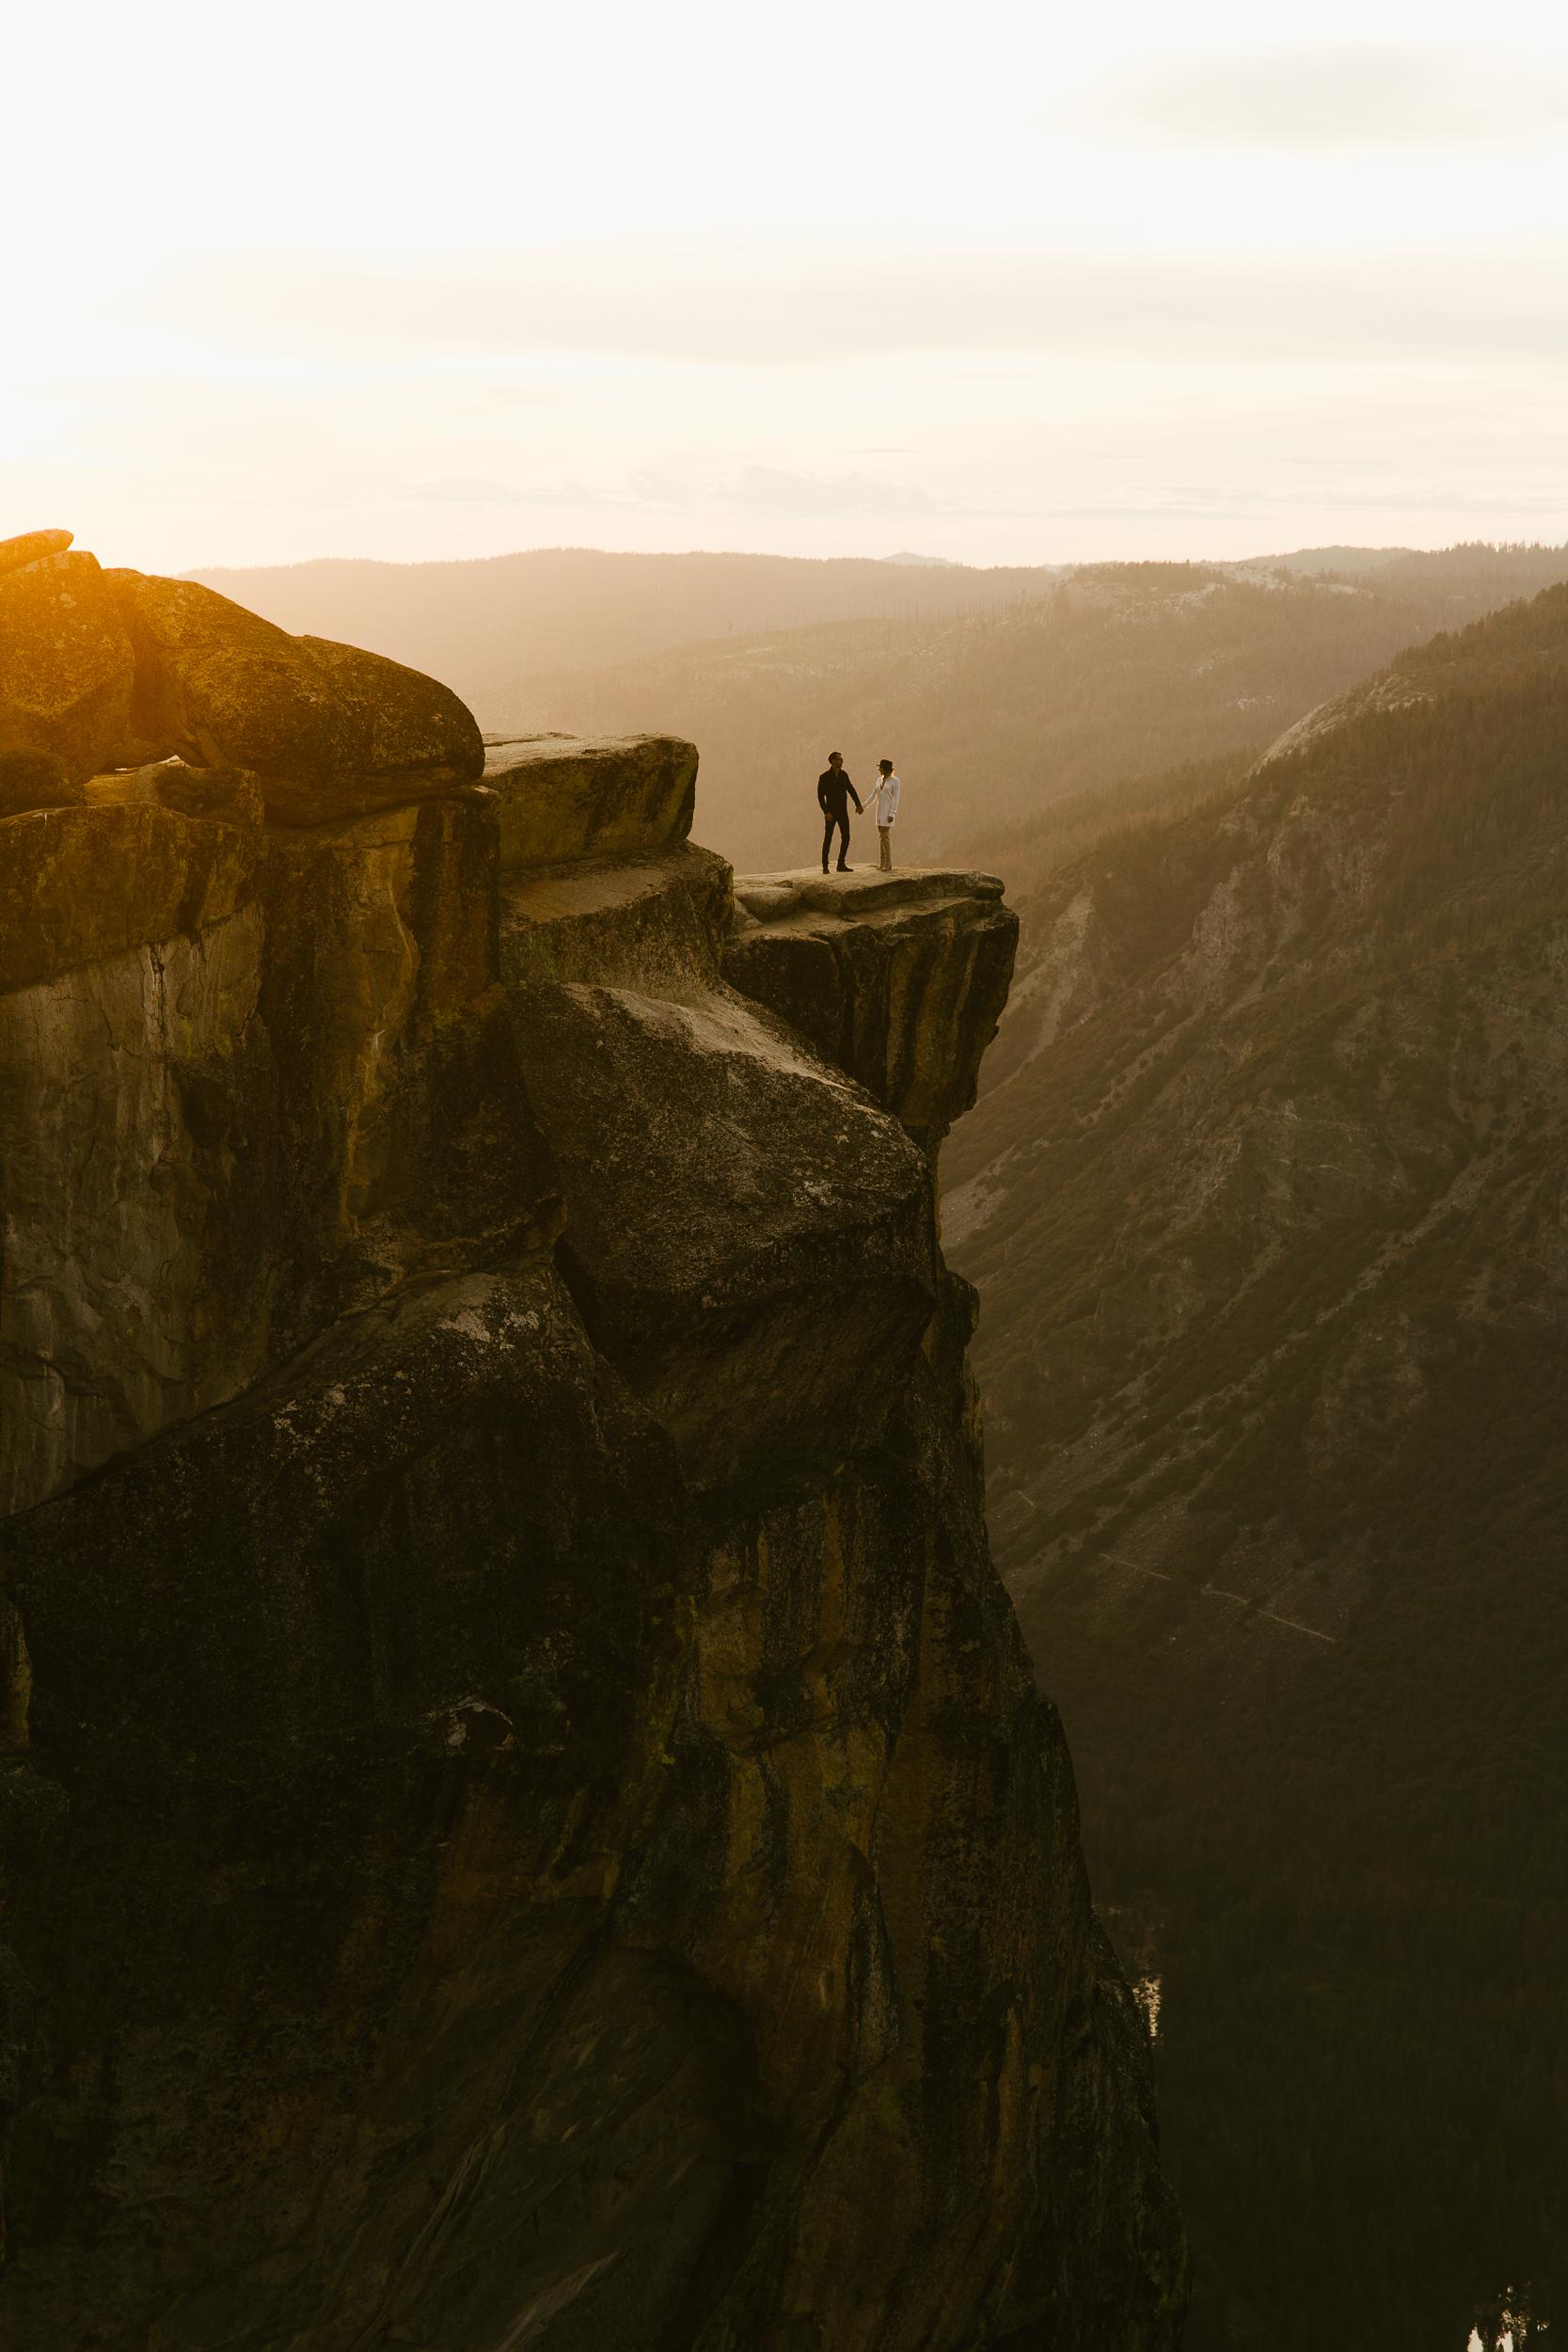 YosemiteElopementPhotographyJacquesFlynnLisaKarst30.jpg